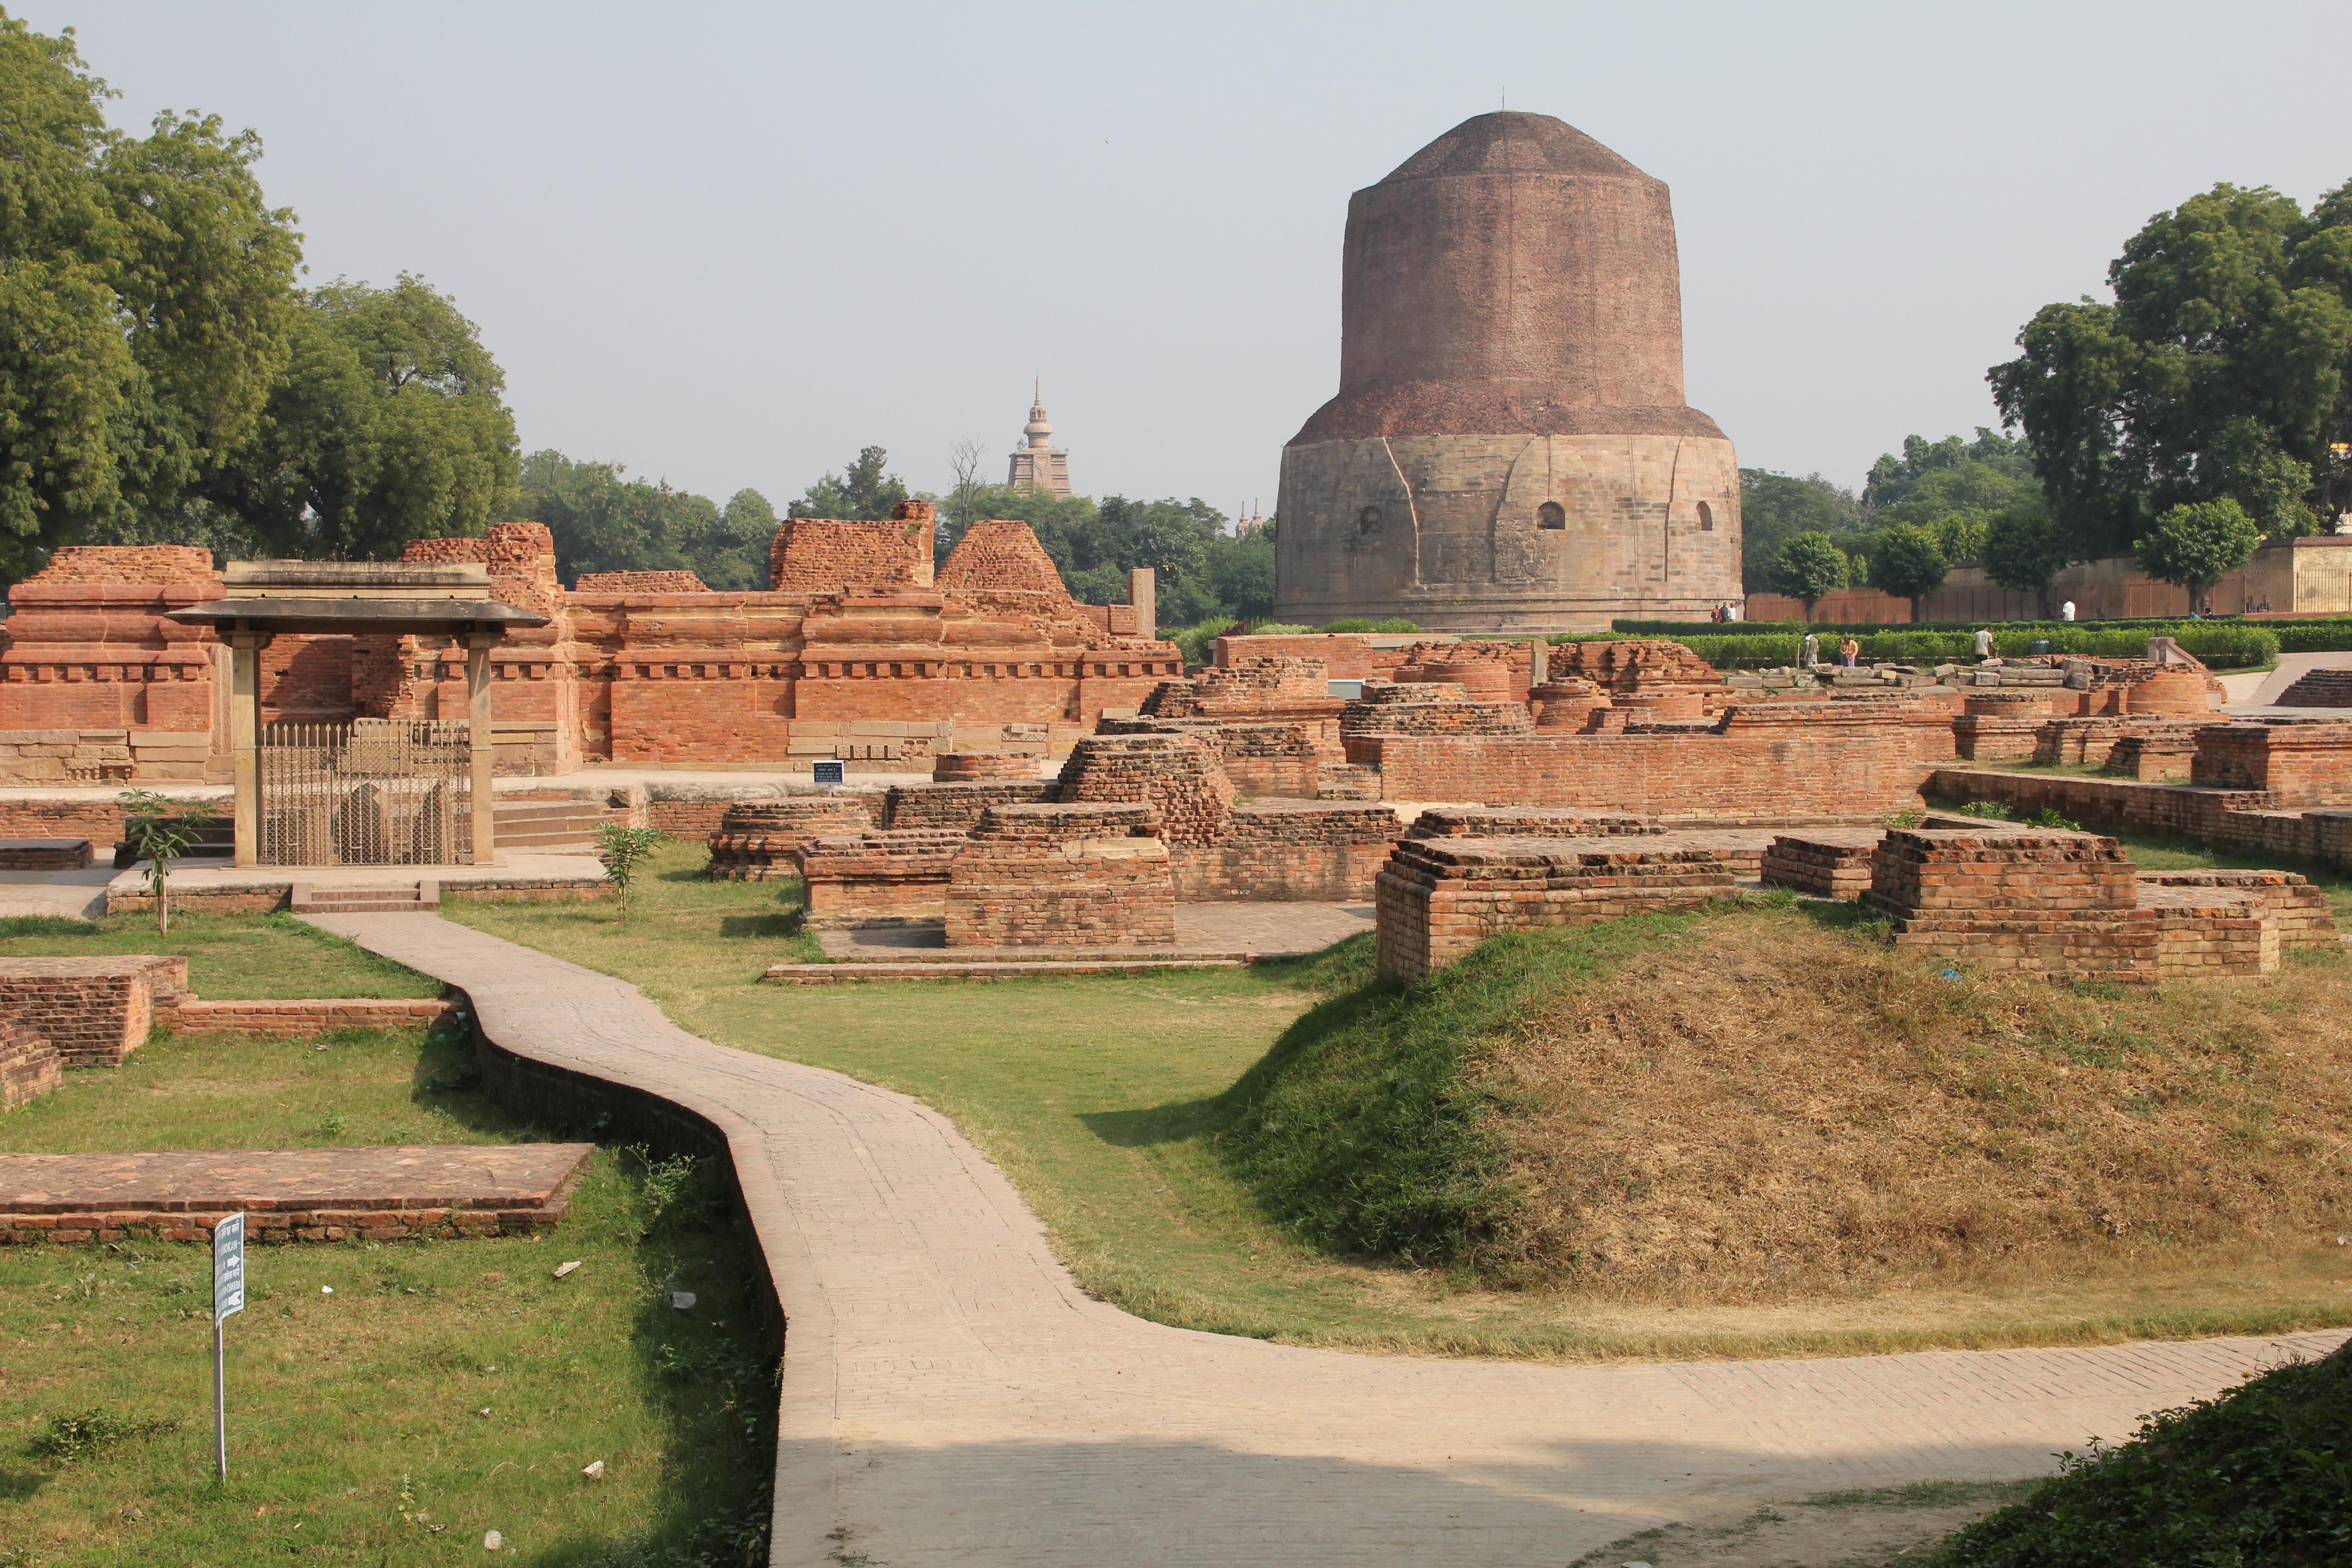 The origin and types of monasticism